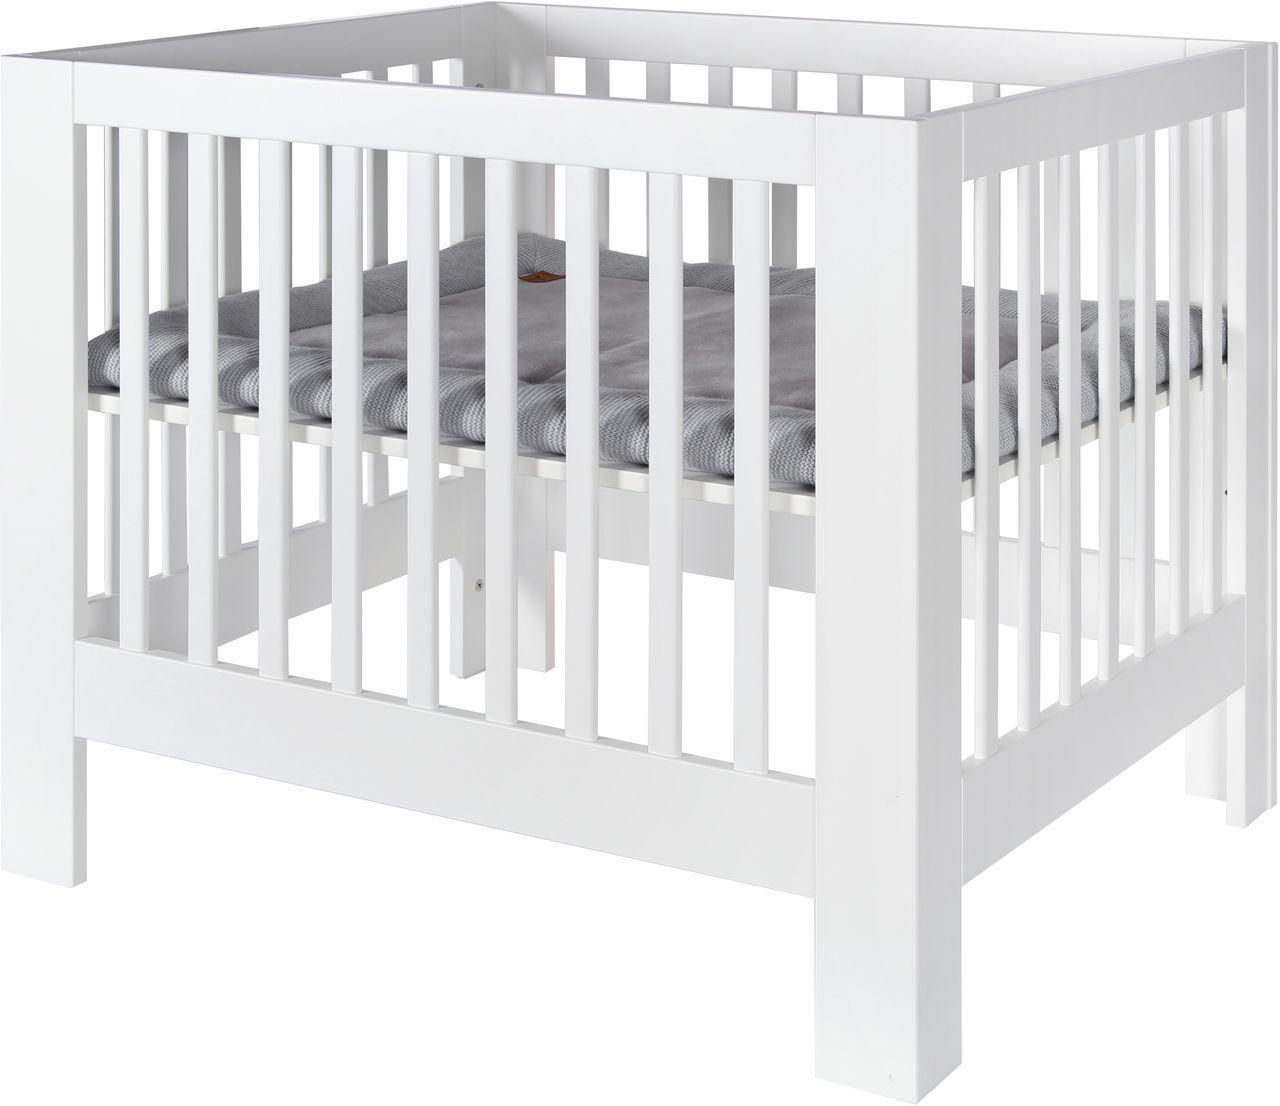 kidsmill laufgitter laufstall crystal wei matt laufgitter kinderzimmerm bel kinderzimmer. Black Bedroom Furniture Sets. Home Design Ideas